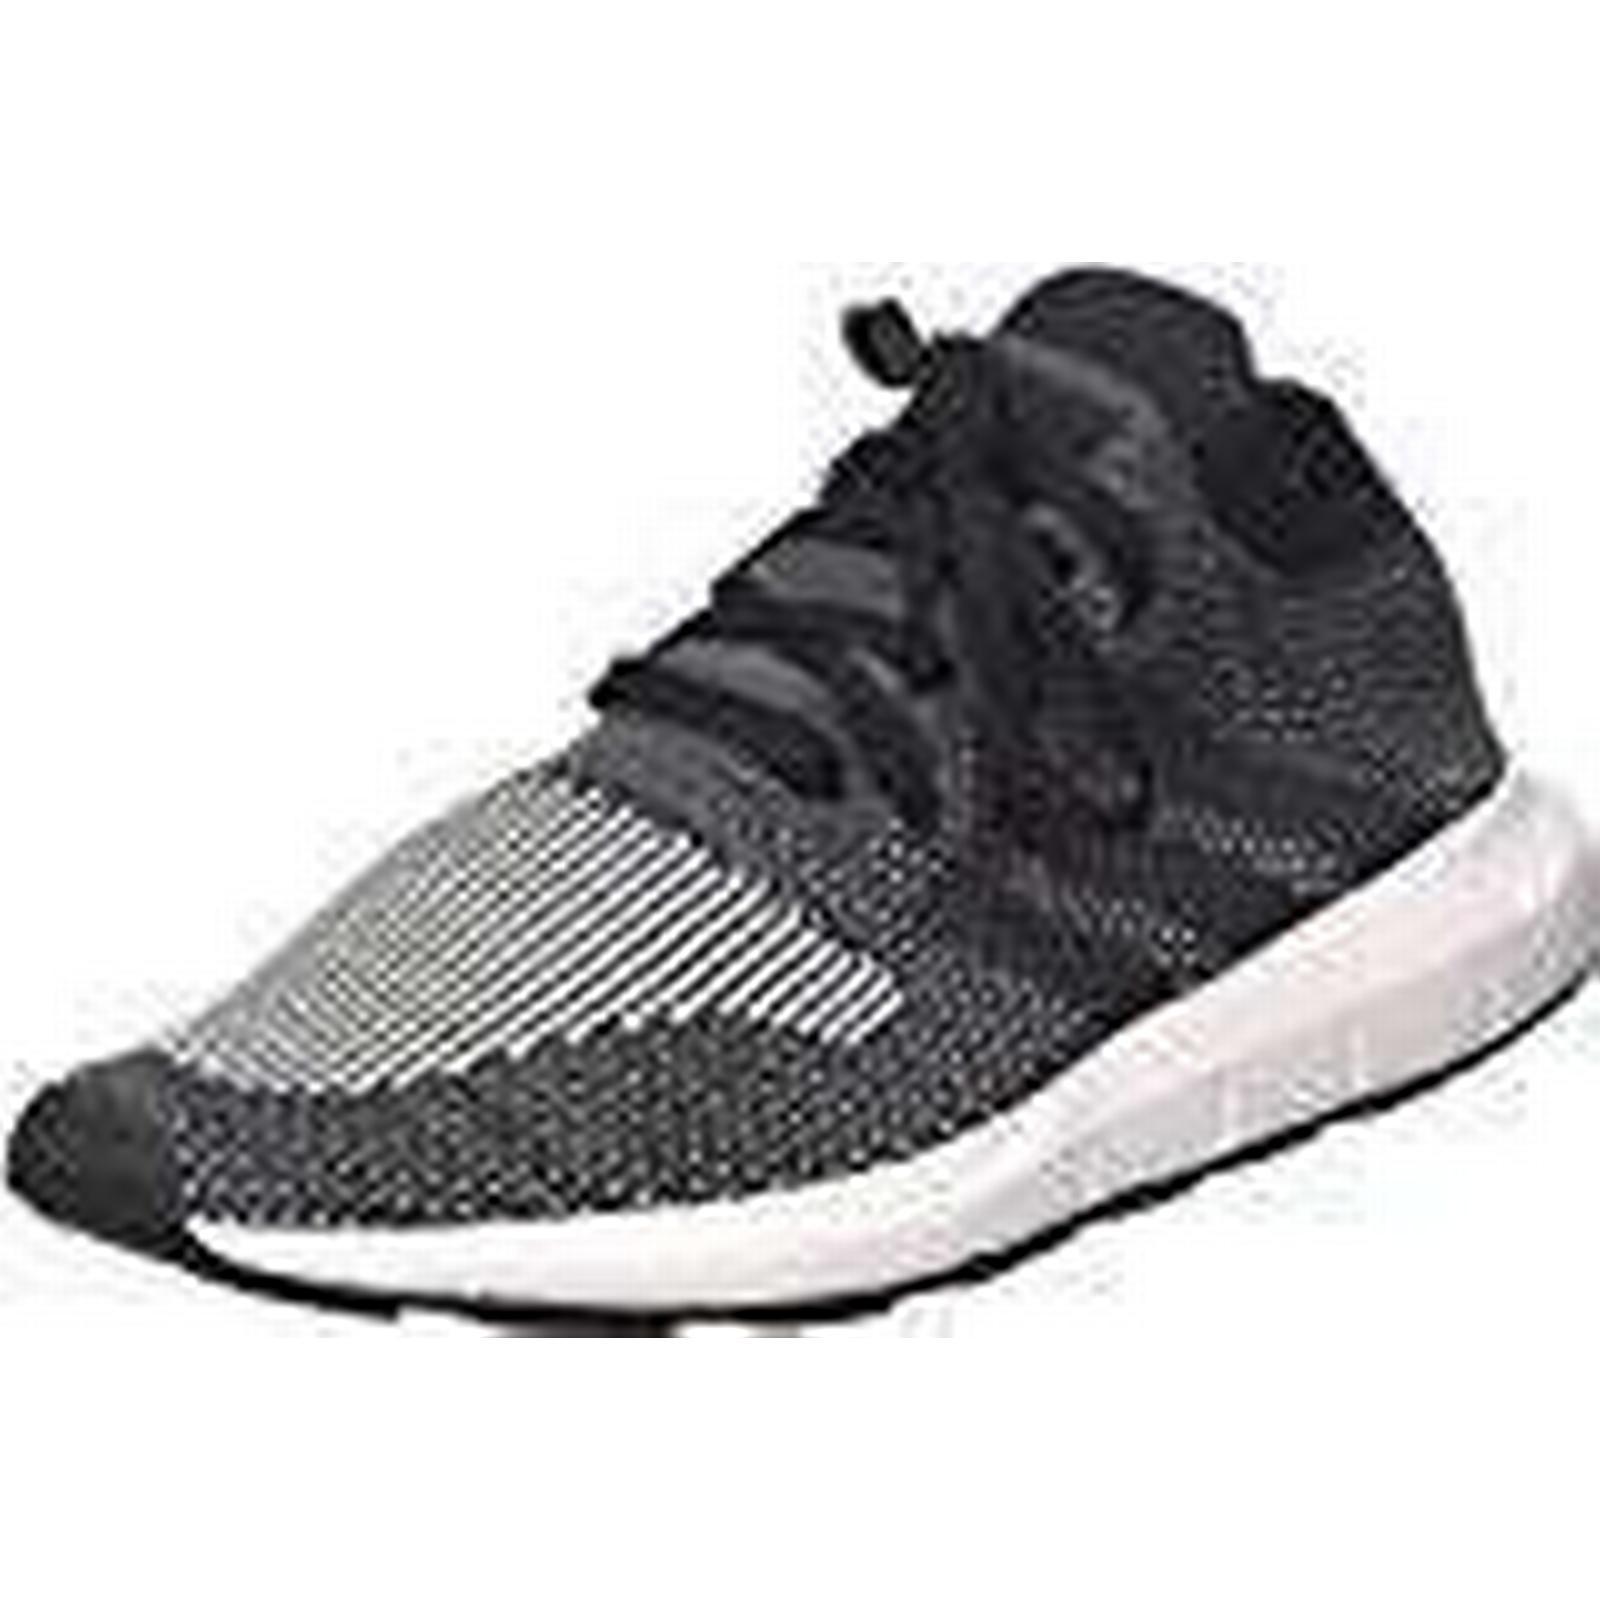 Adidas Men's Swift Run Medium Primeknit Trainers, (Core Black Medium Run Grey Heather), 8.5 UK 42 2/3 EU 81093a